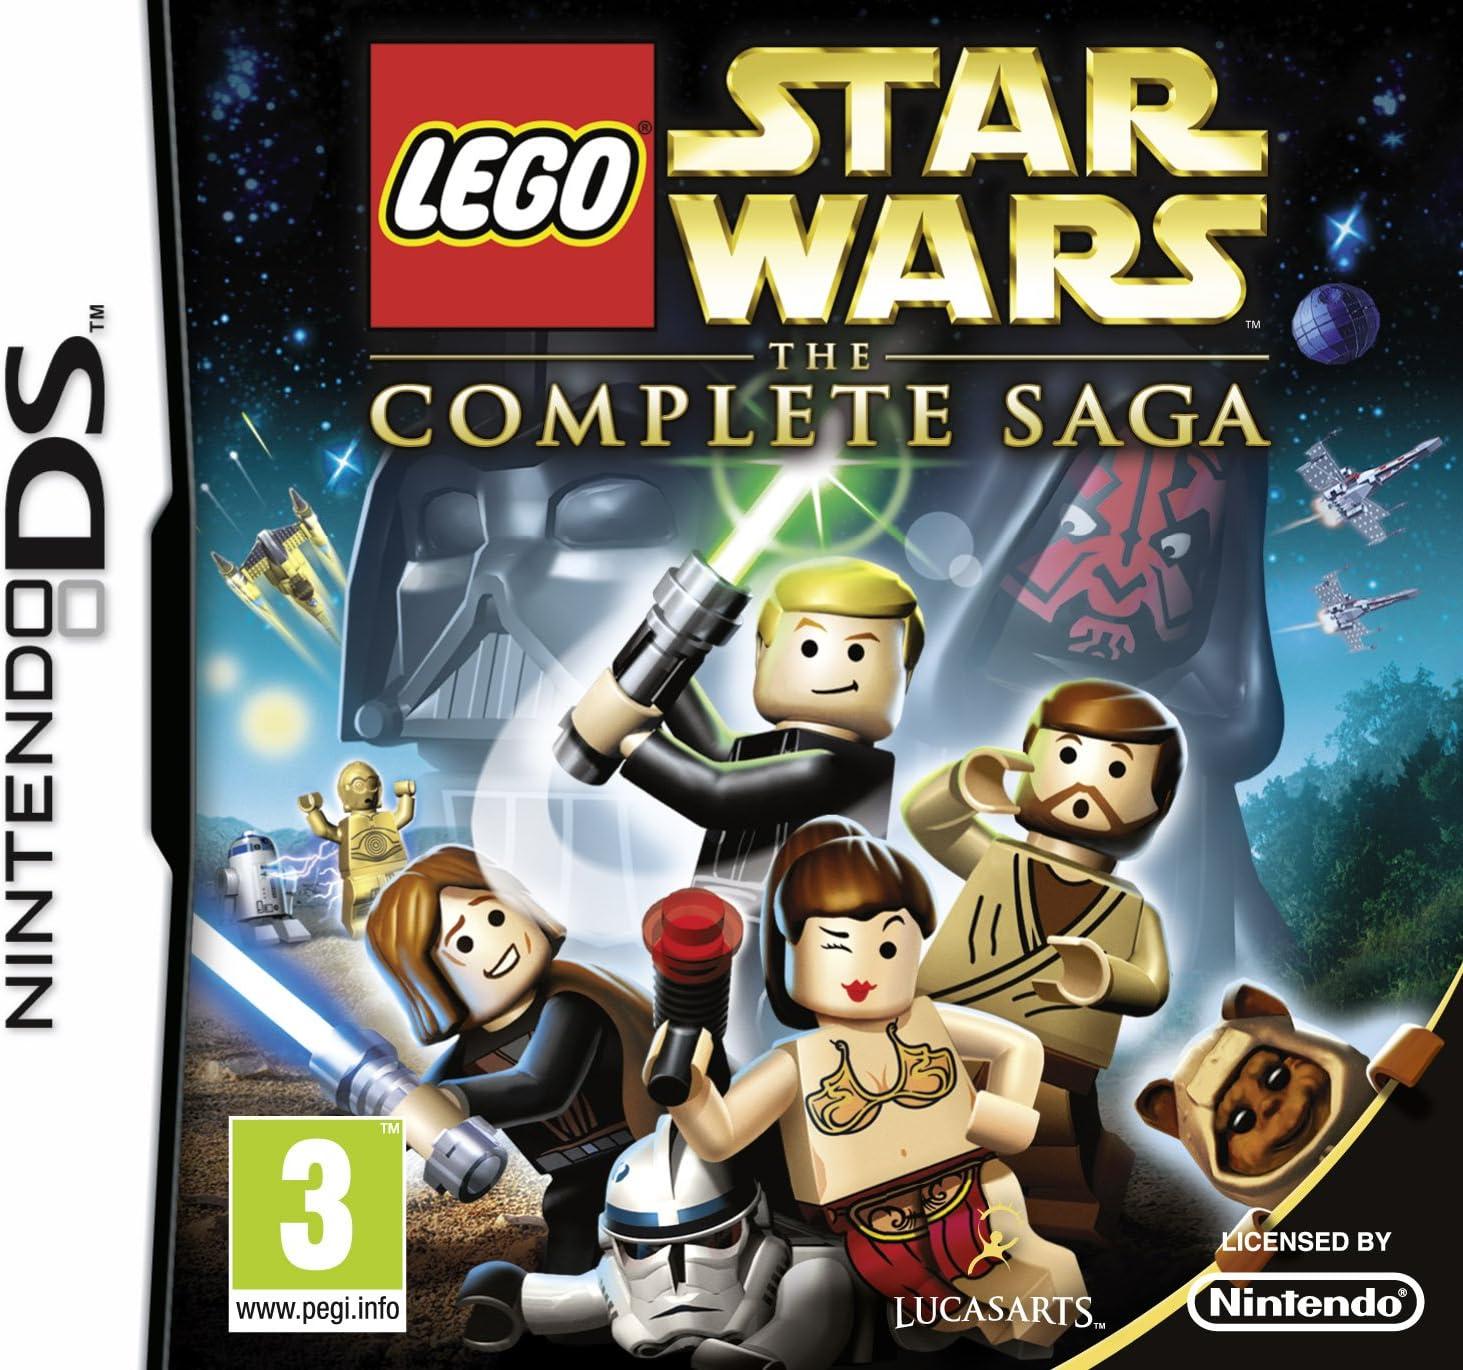 Lego Star Wars The Complete Saga Nintendo DS Game UK: Amazon.es: Videojuegos